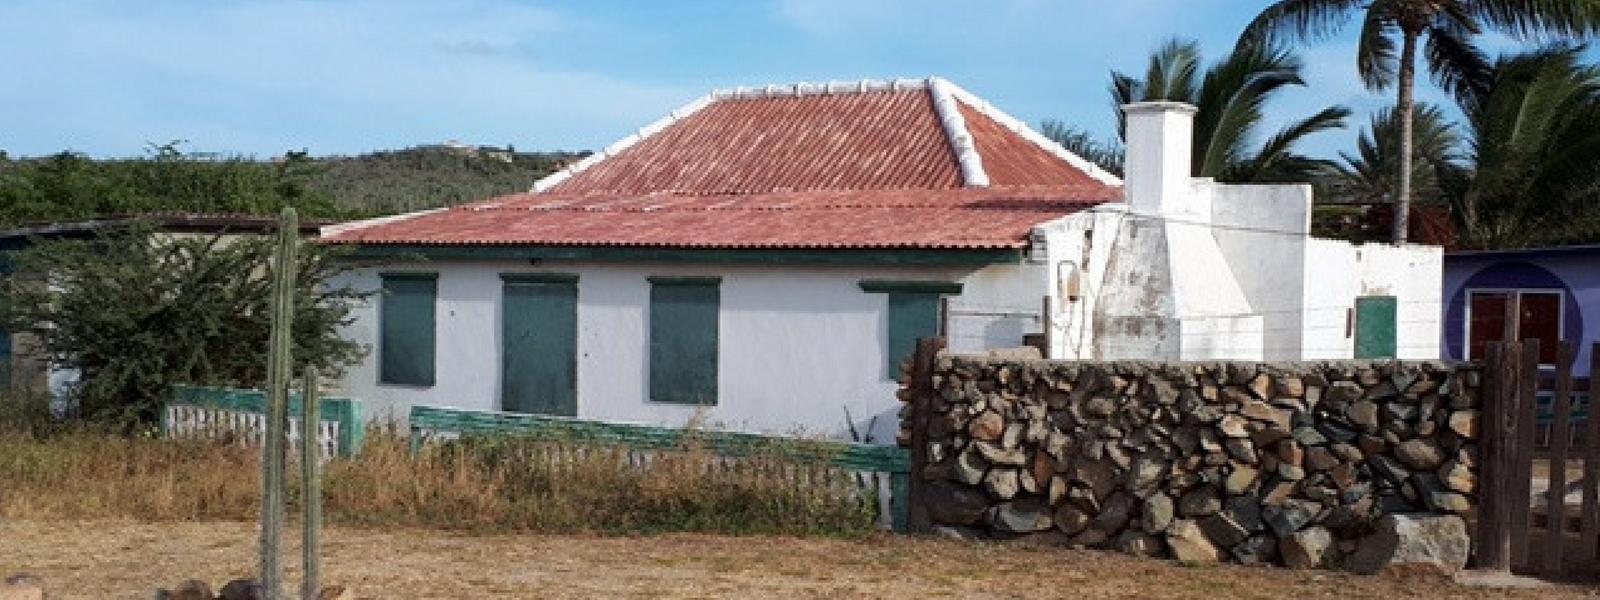 Cunucu huisjes, je ziet ze overal op Aruba!